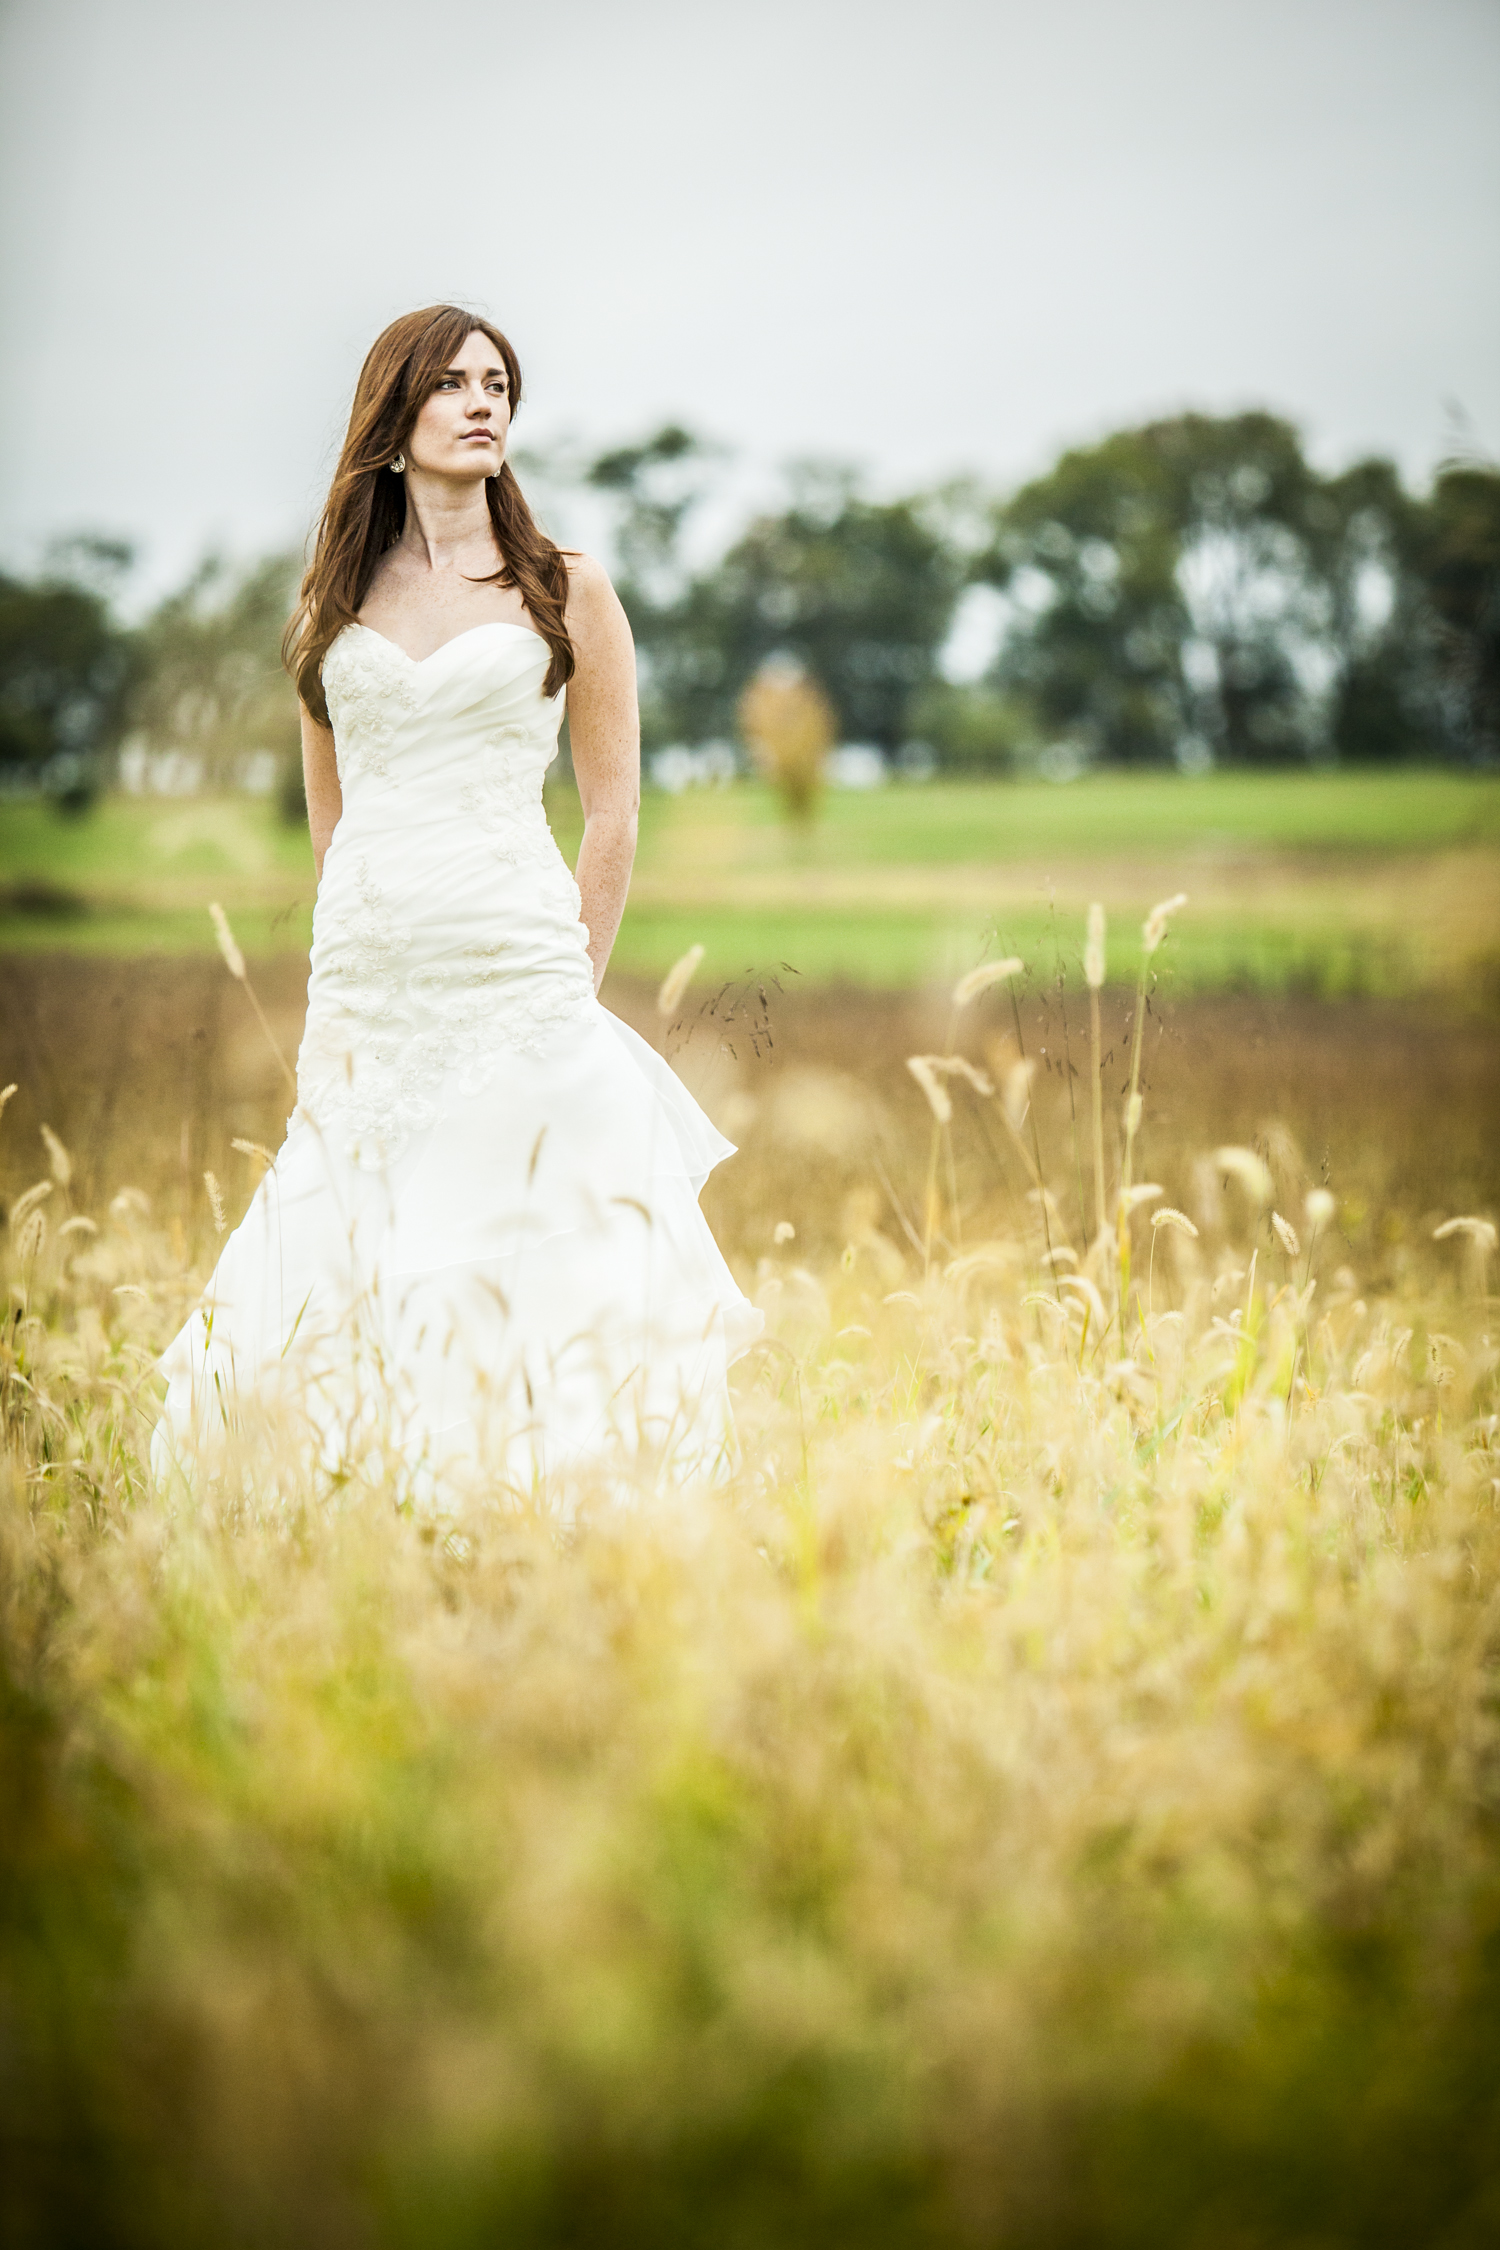 Emily-Bridal-Portraits-3